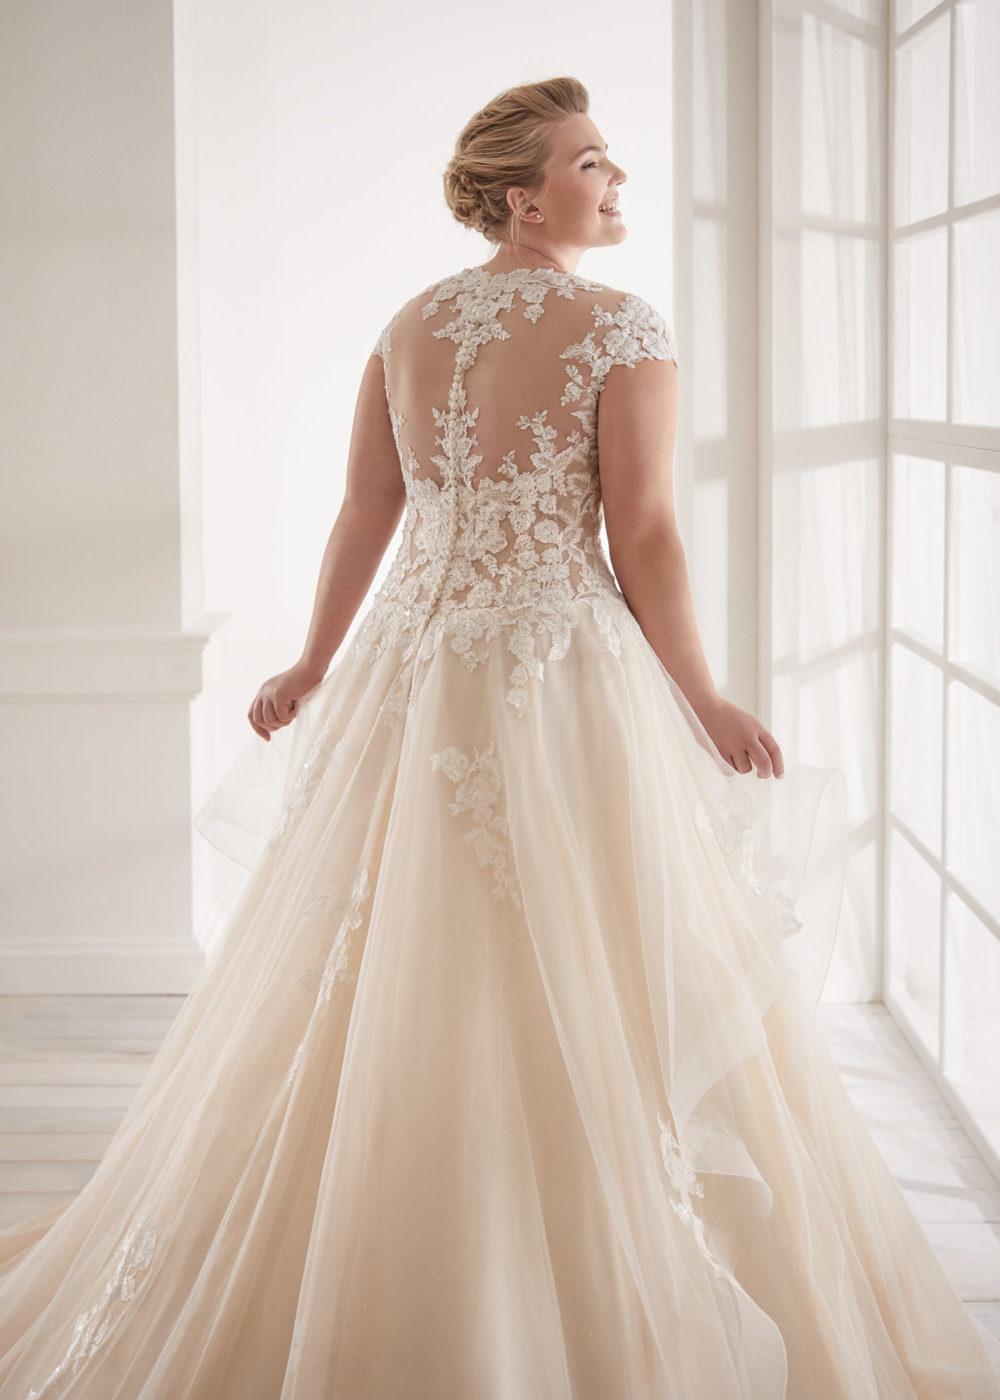 Mariages: abito da sposa Curvy 2020 a Vicenza, Verona, Padova, Veneto CVA20131